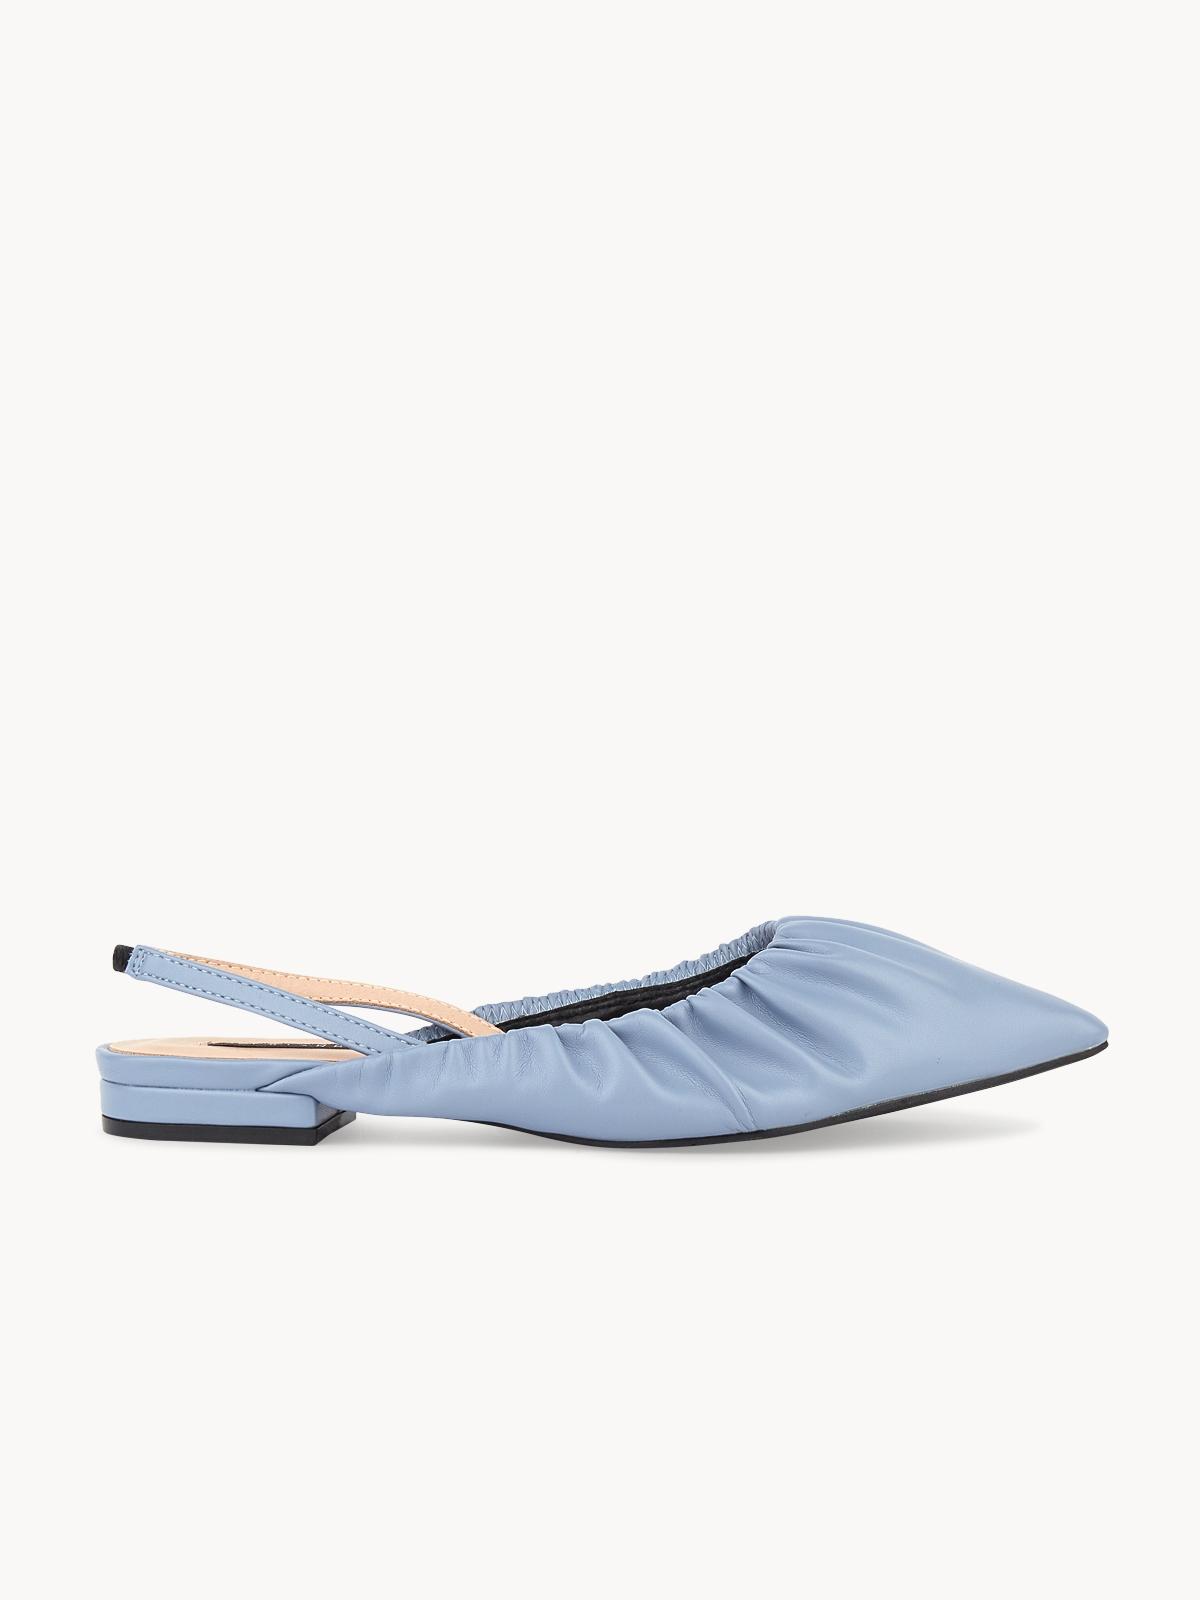 Starkela Flat Slingback Mules Blue